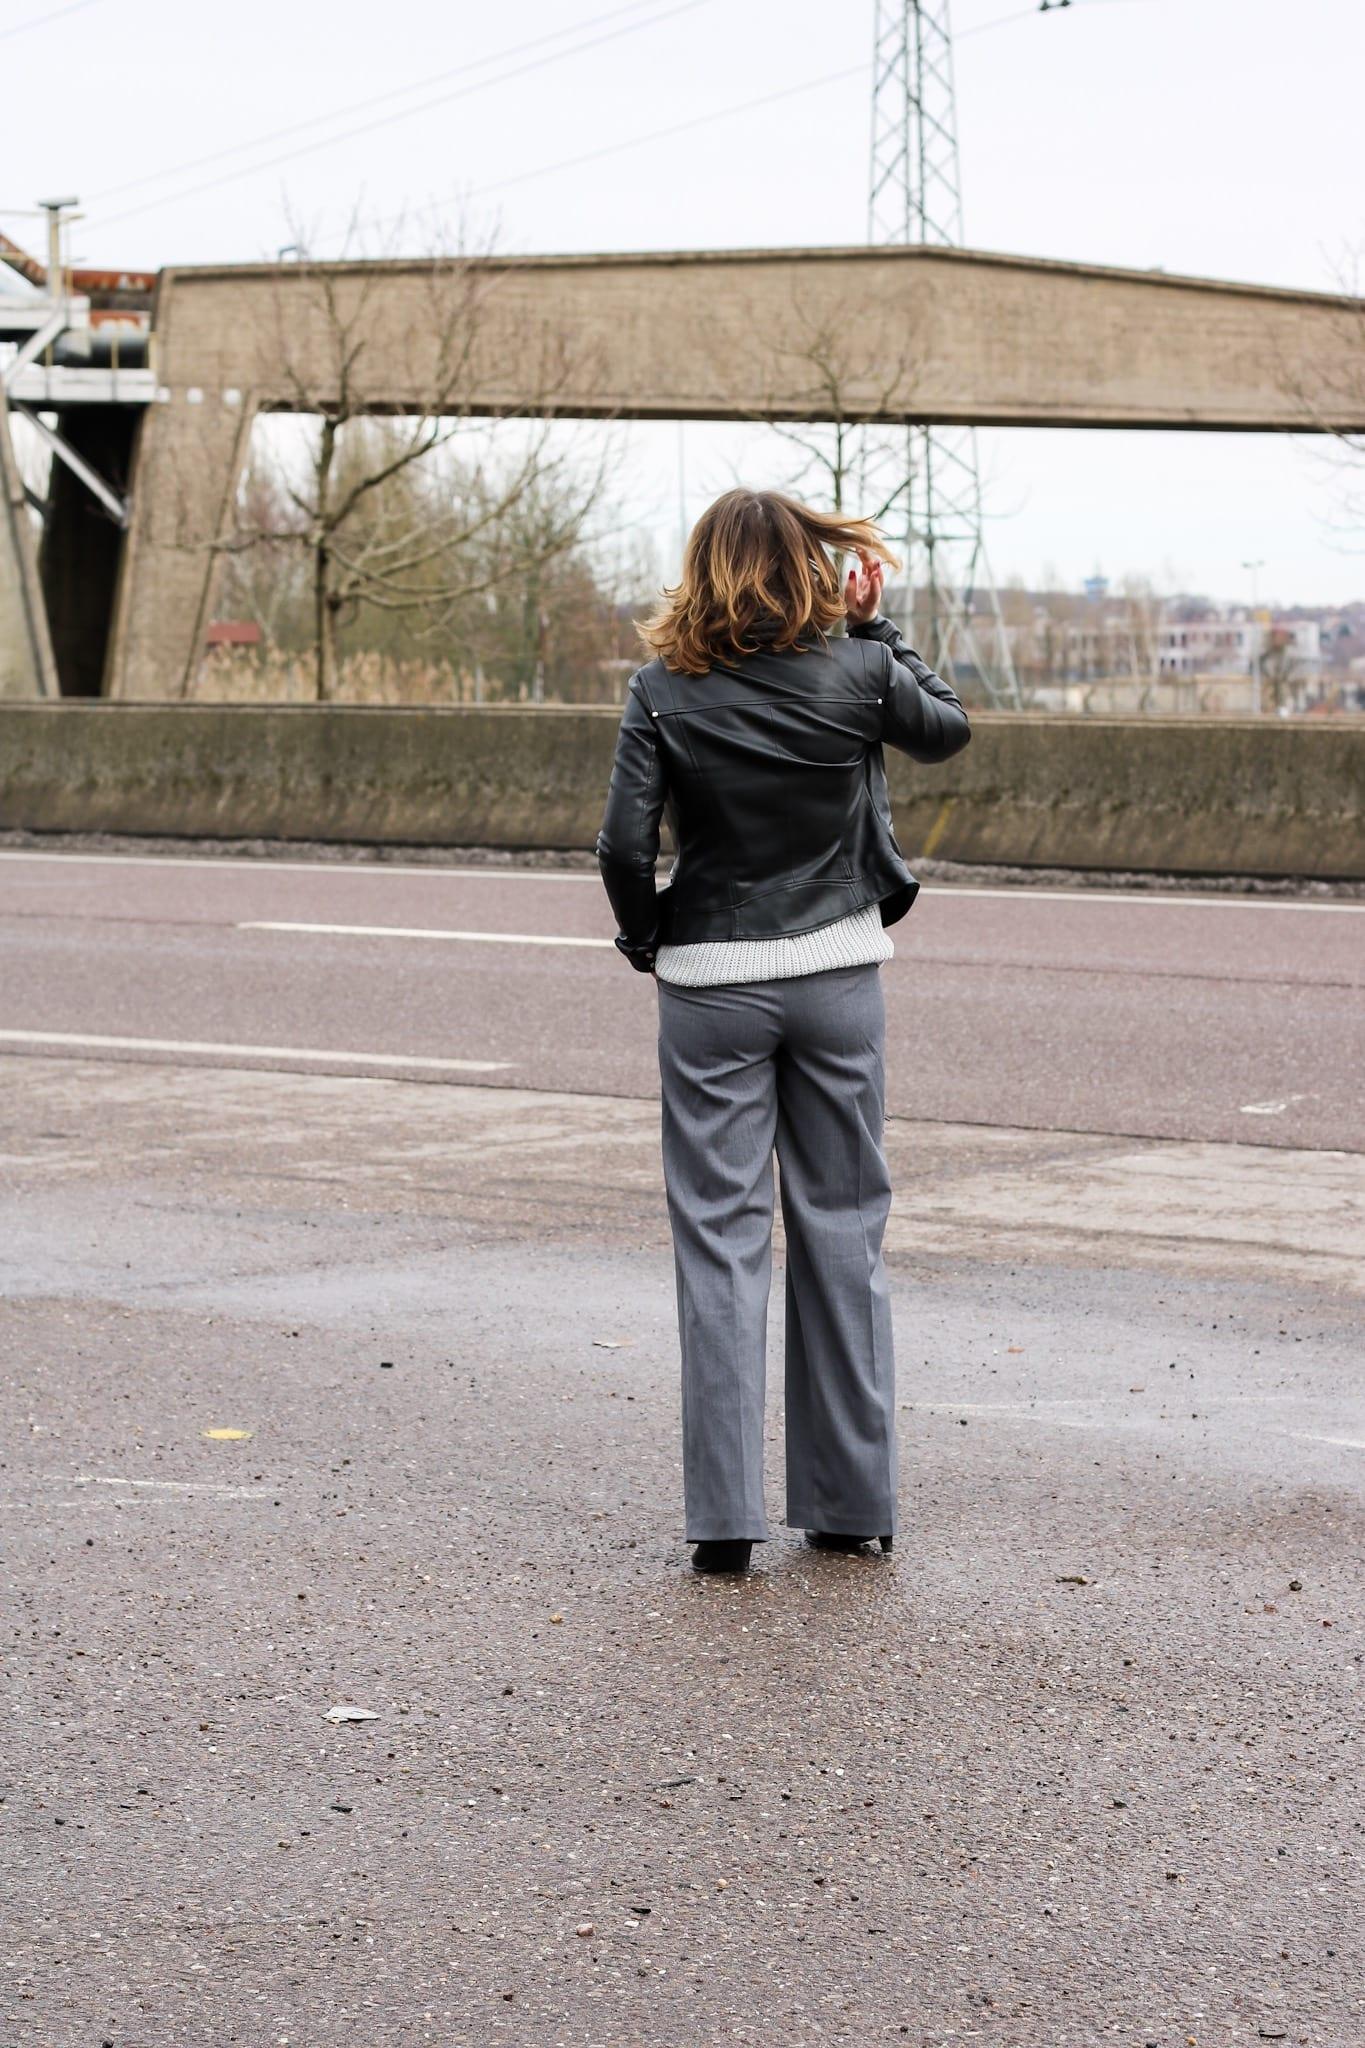 Ü40 Saarland Bloggerin